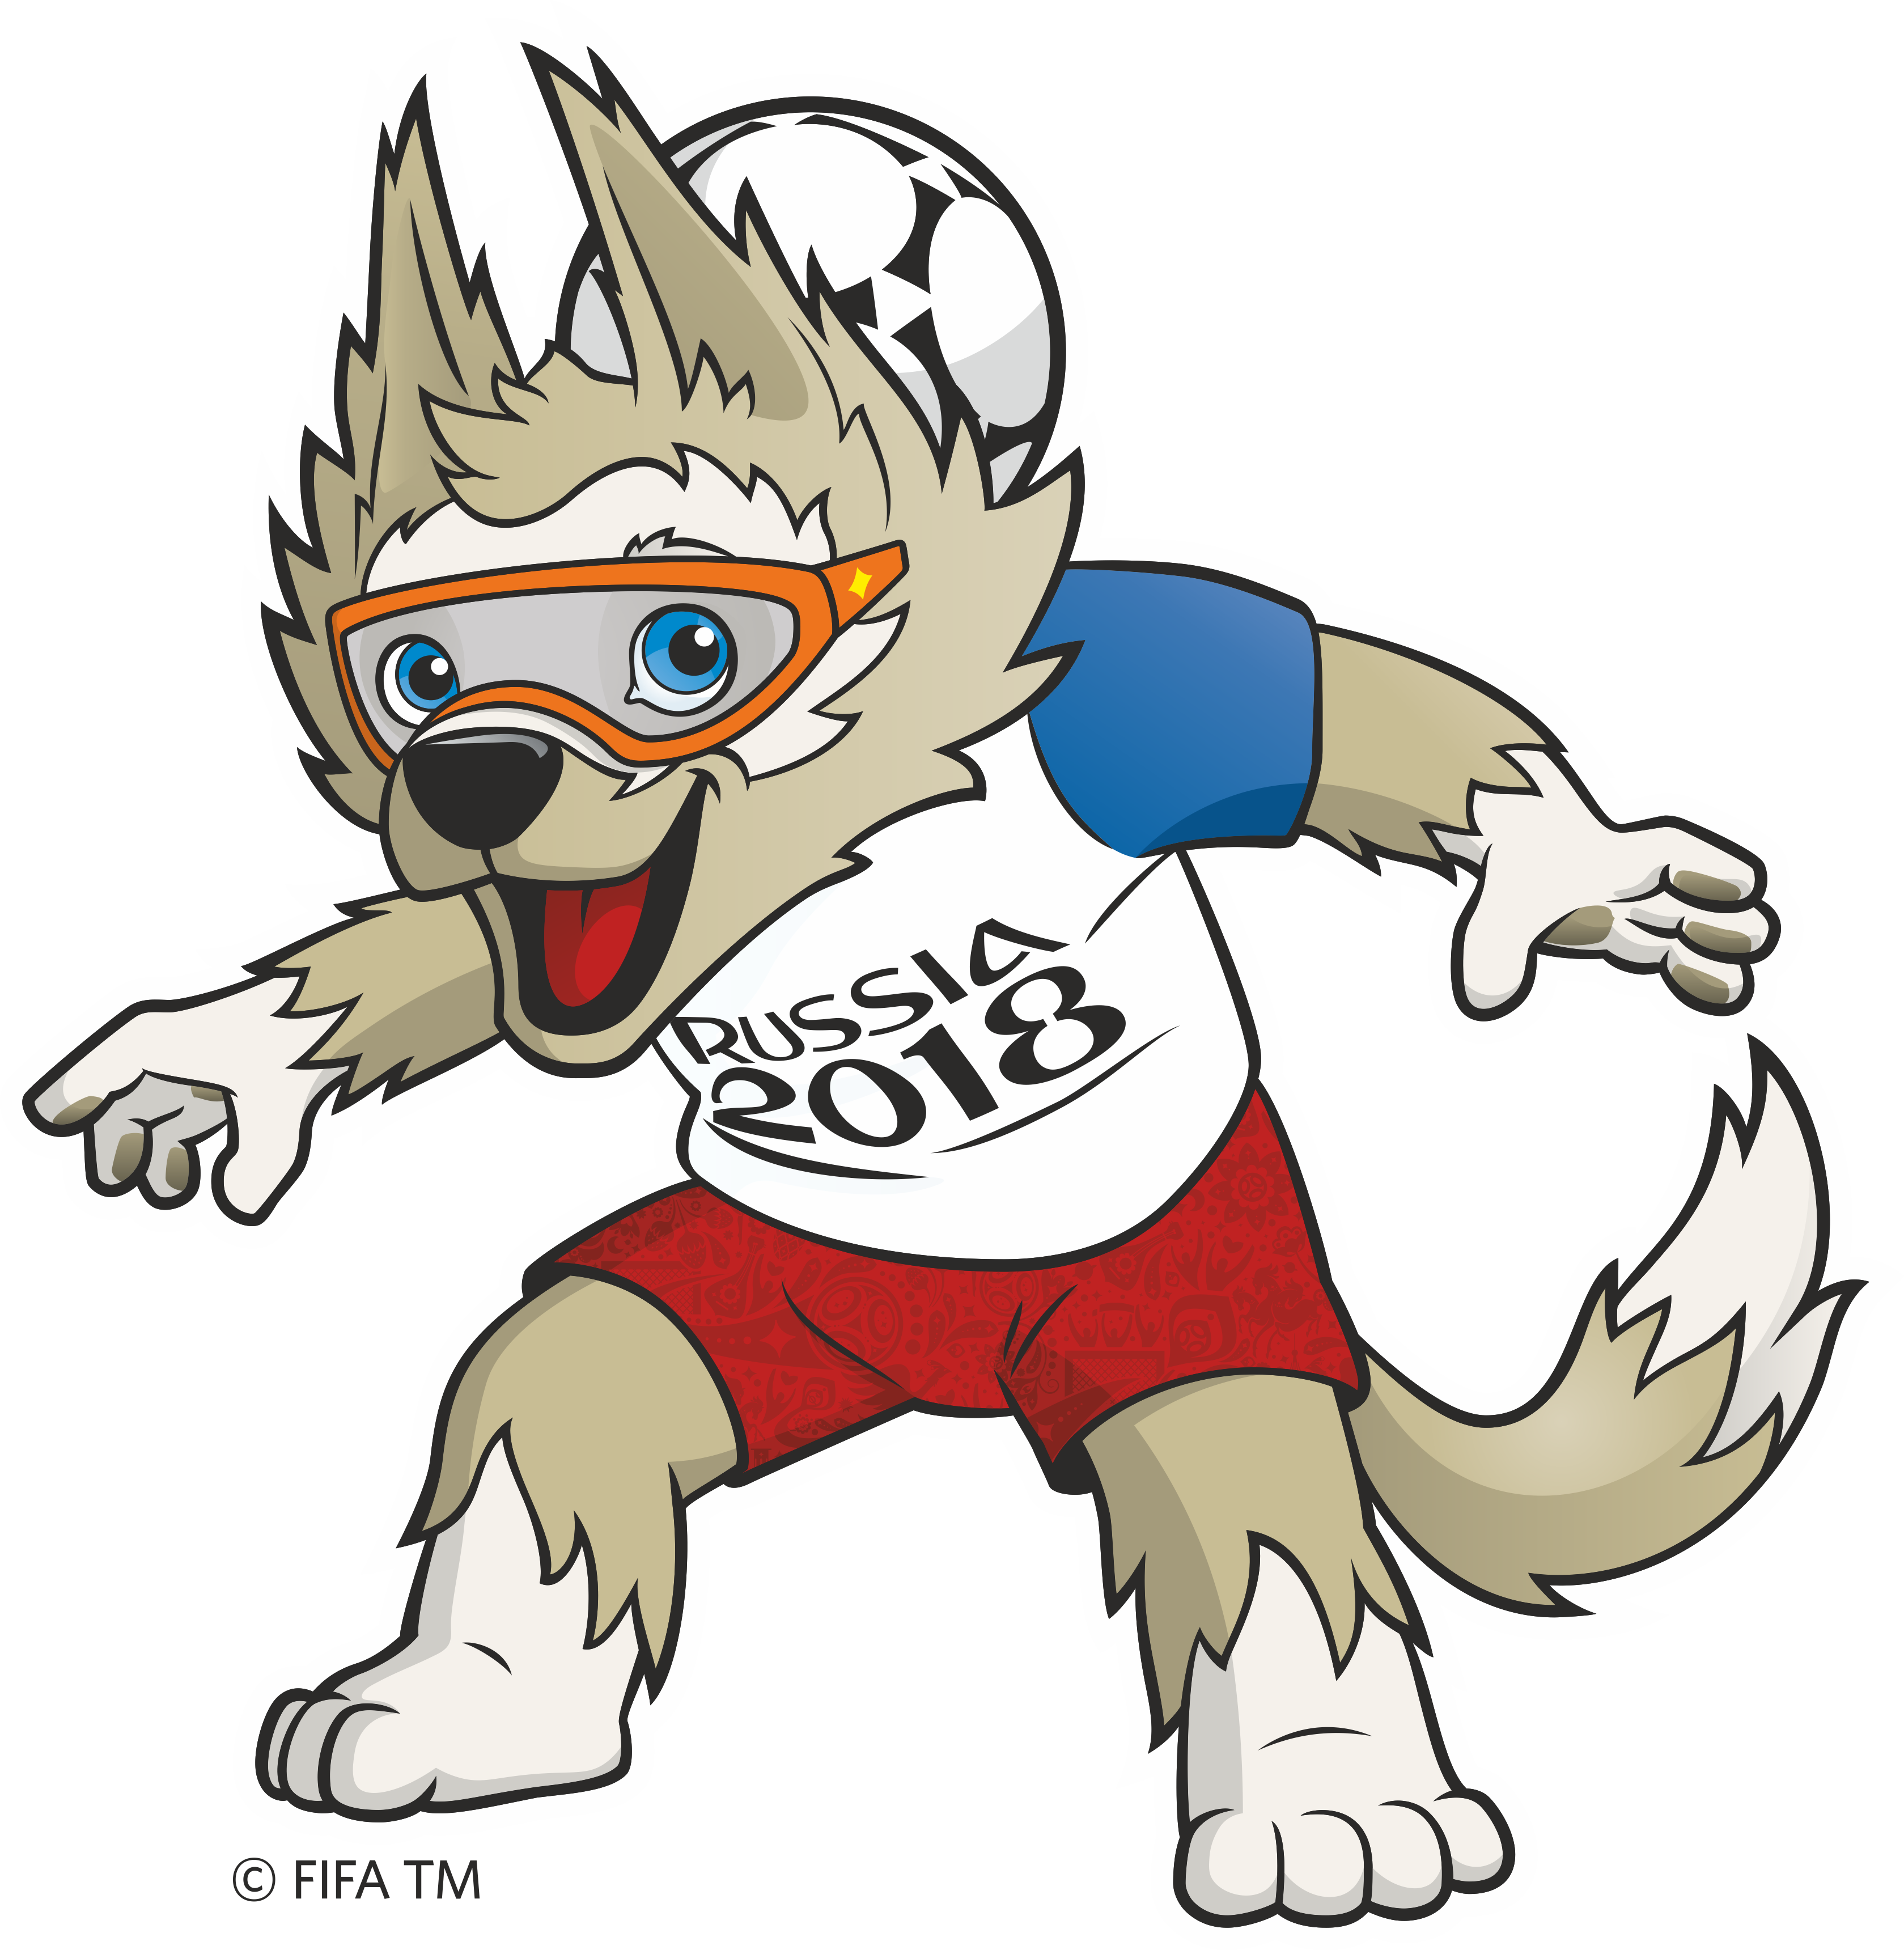 pin oleh fand bendot di dunia olahraga royal928 piala dunia olahraga gambar anime www pinterest co kr